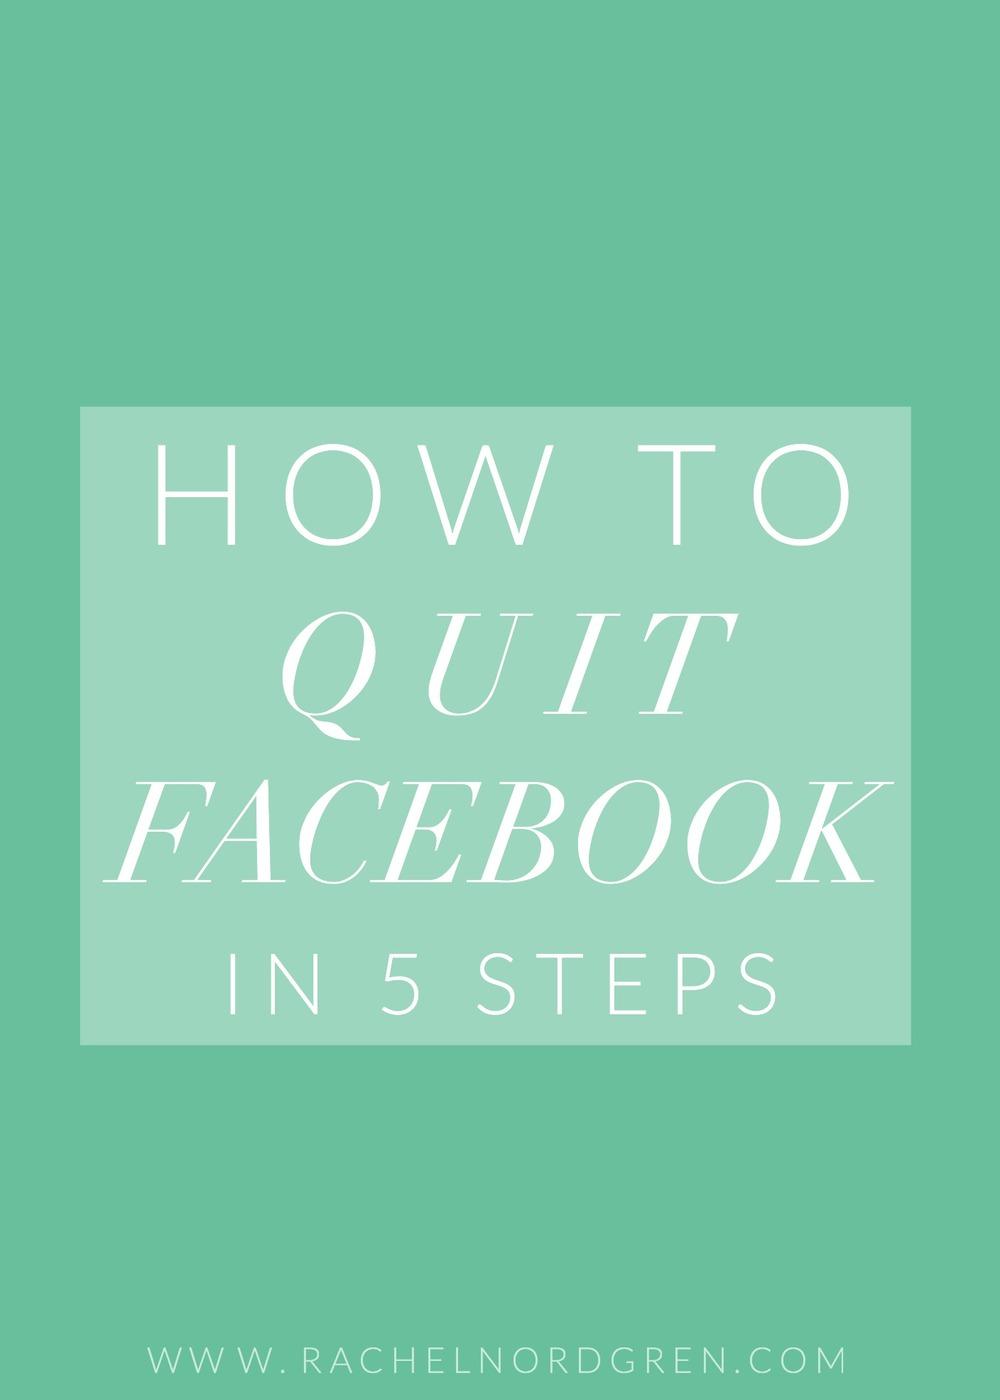 how-to-quit-facebook-11.jpg